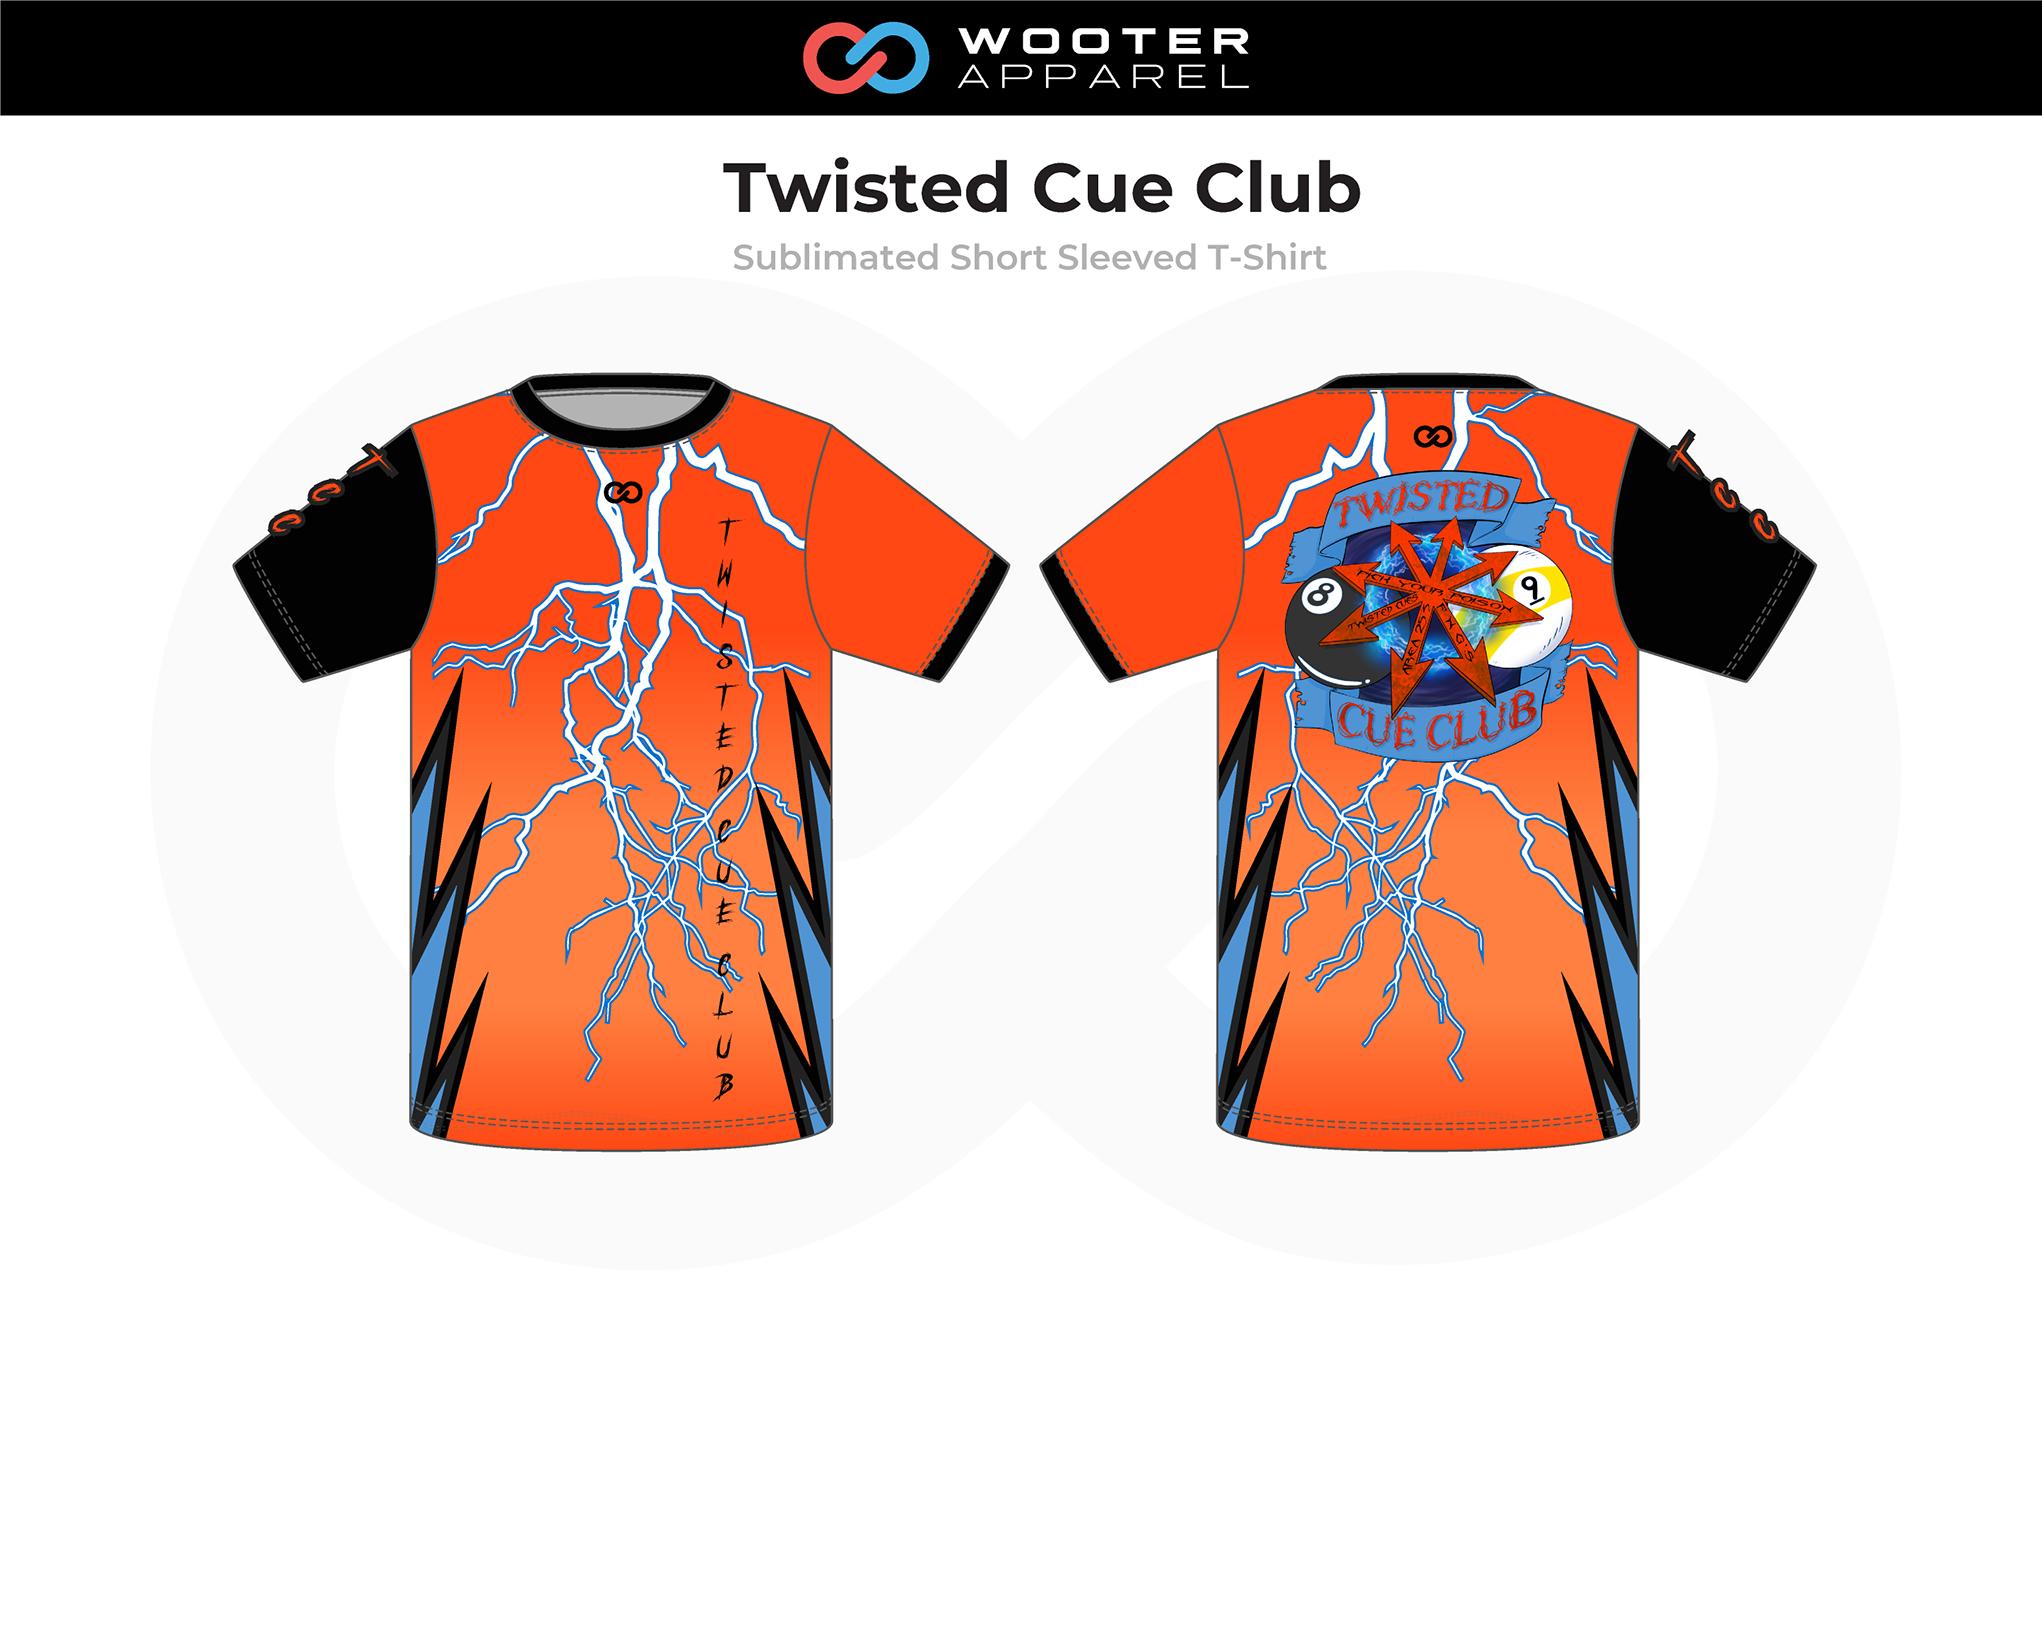 TWISTED CUE CLUB Orange Black Blue Bowling Short Sleeved T-Shirt